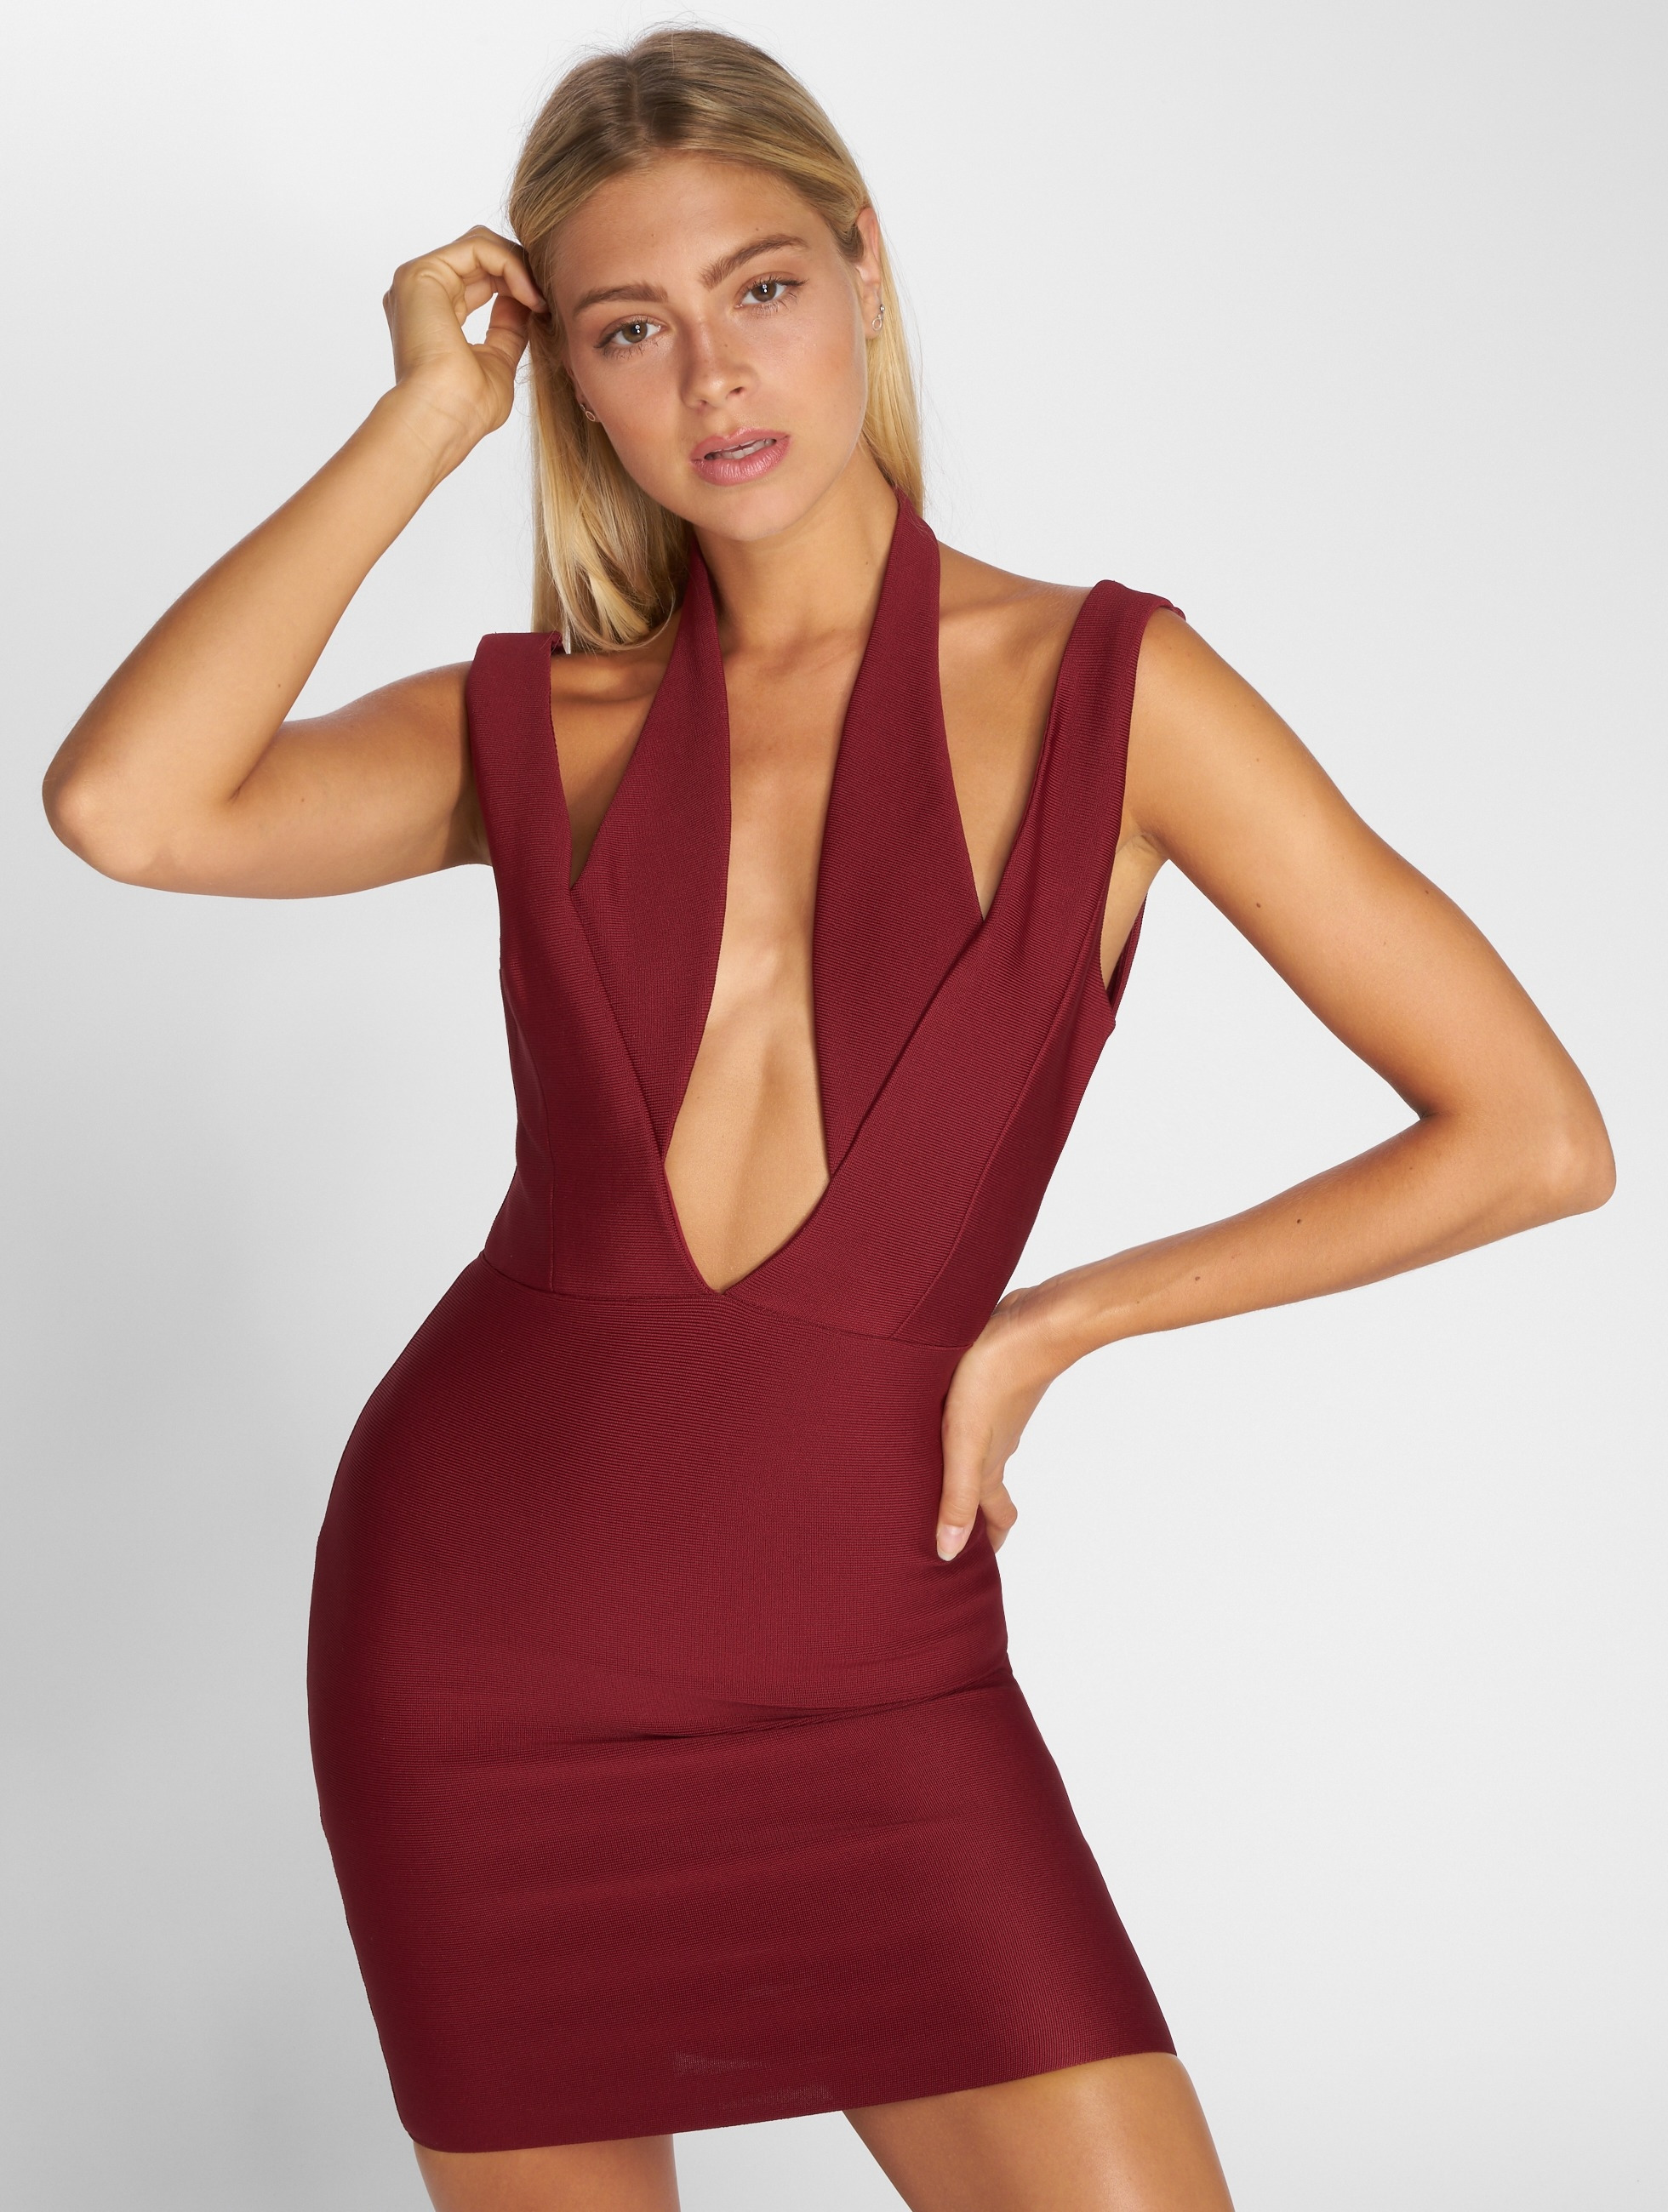 Danity Paris | Straro rouge Femme Robe